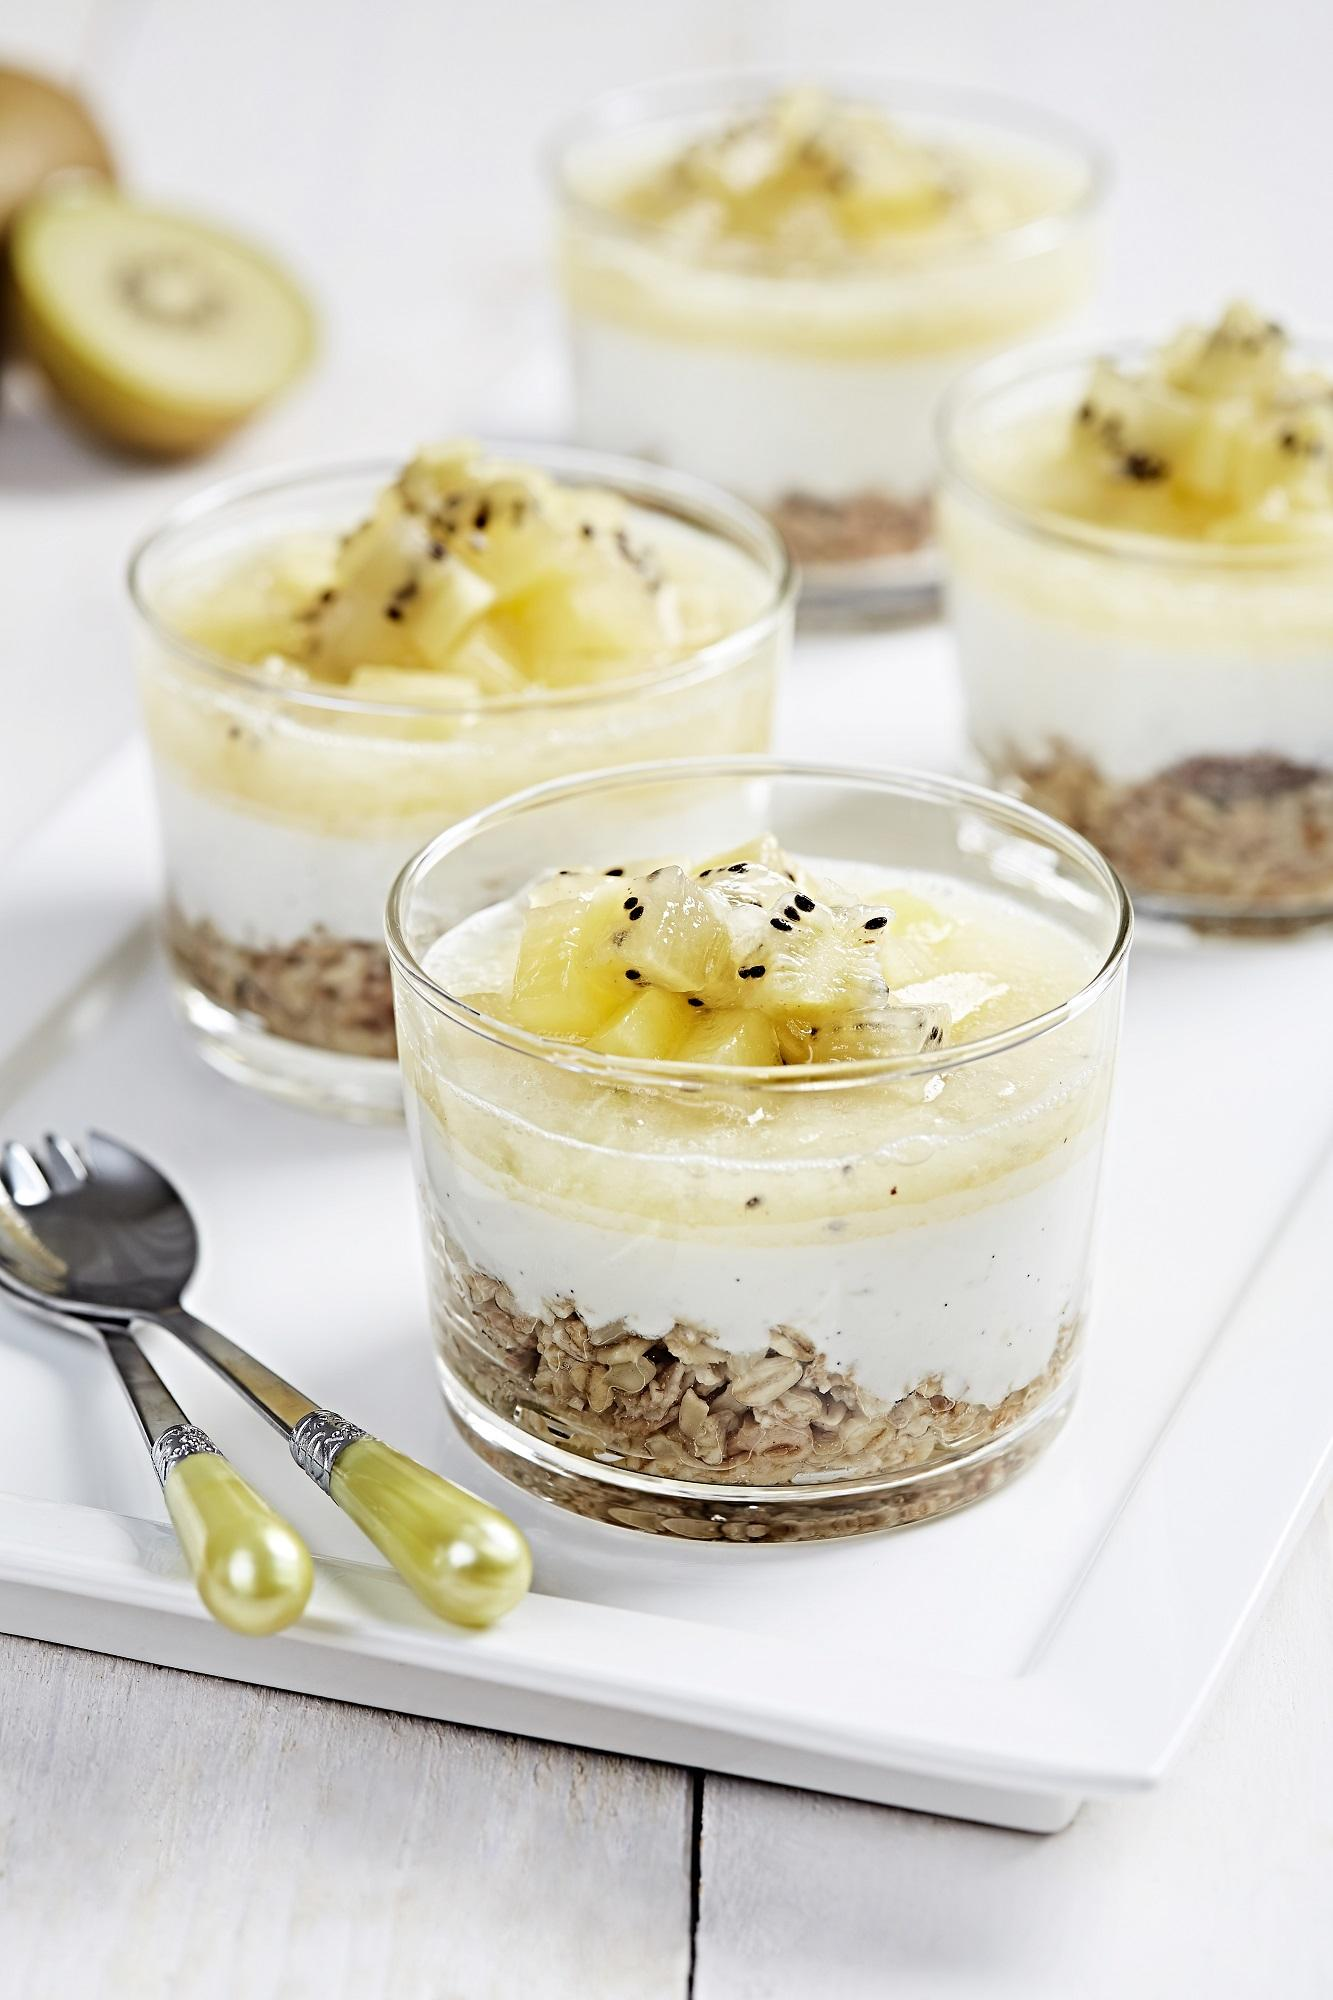 Recette verrine cheesecake kiwi